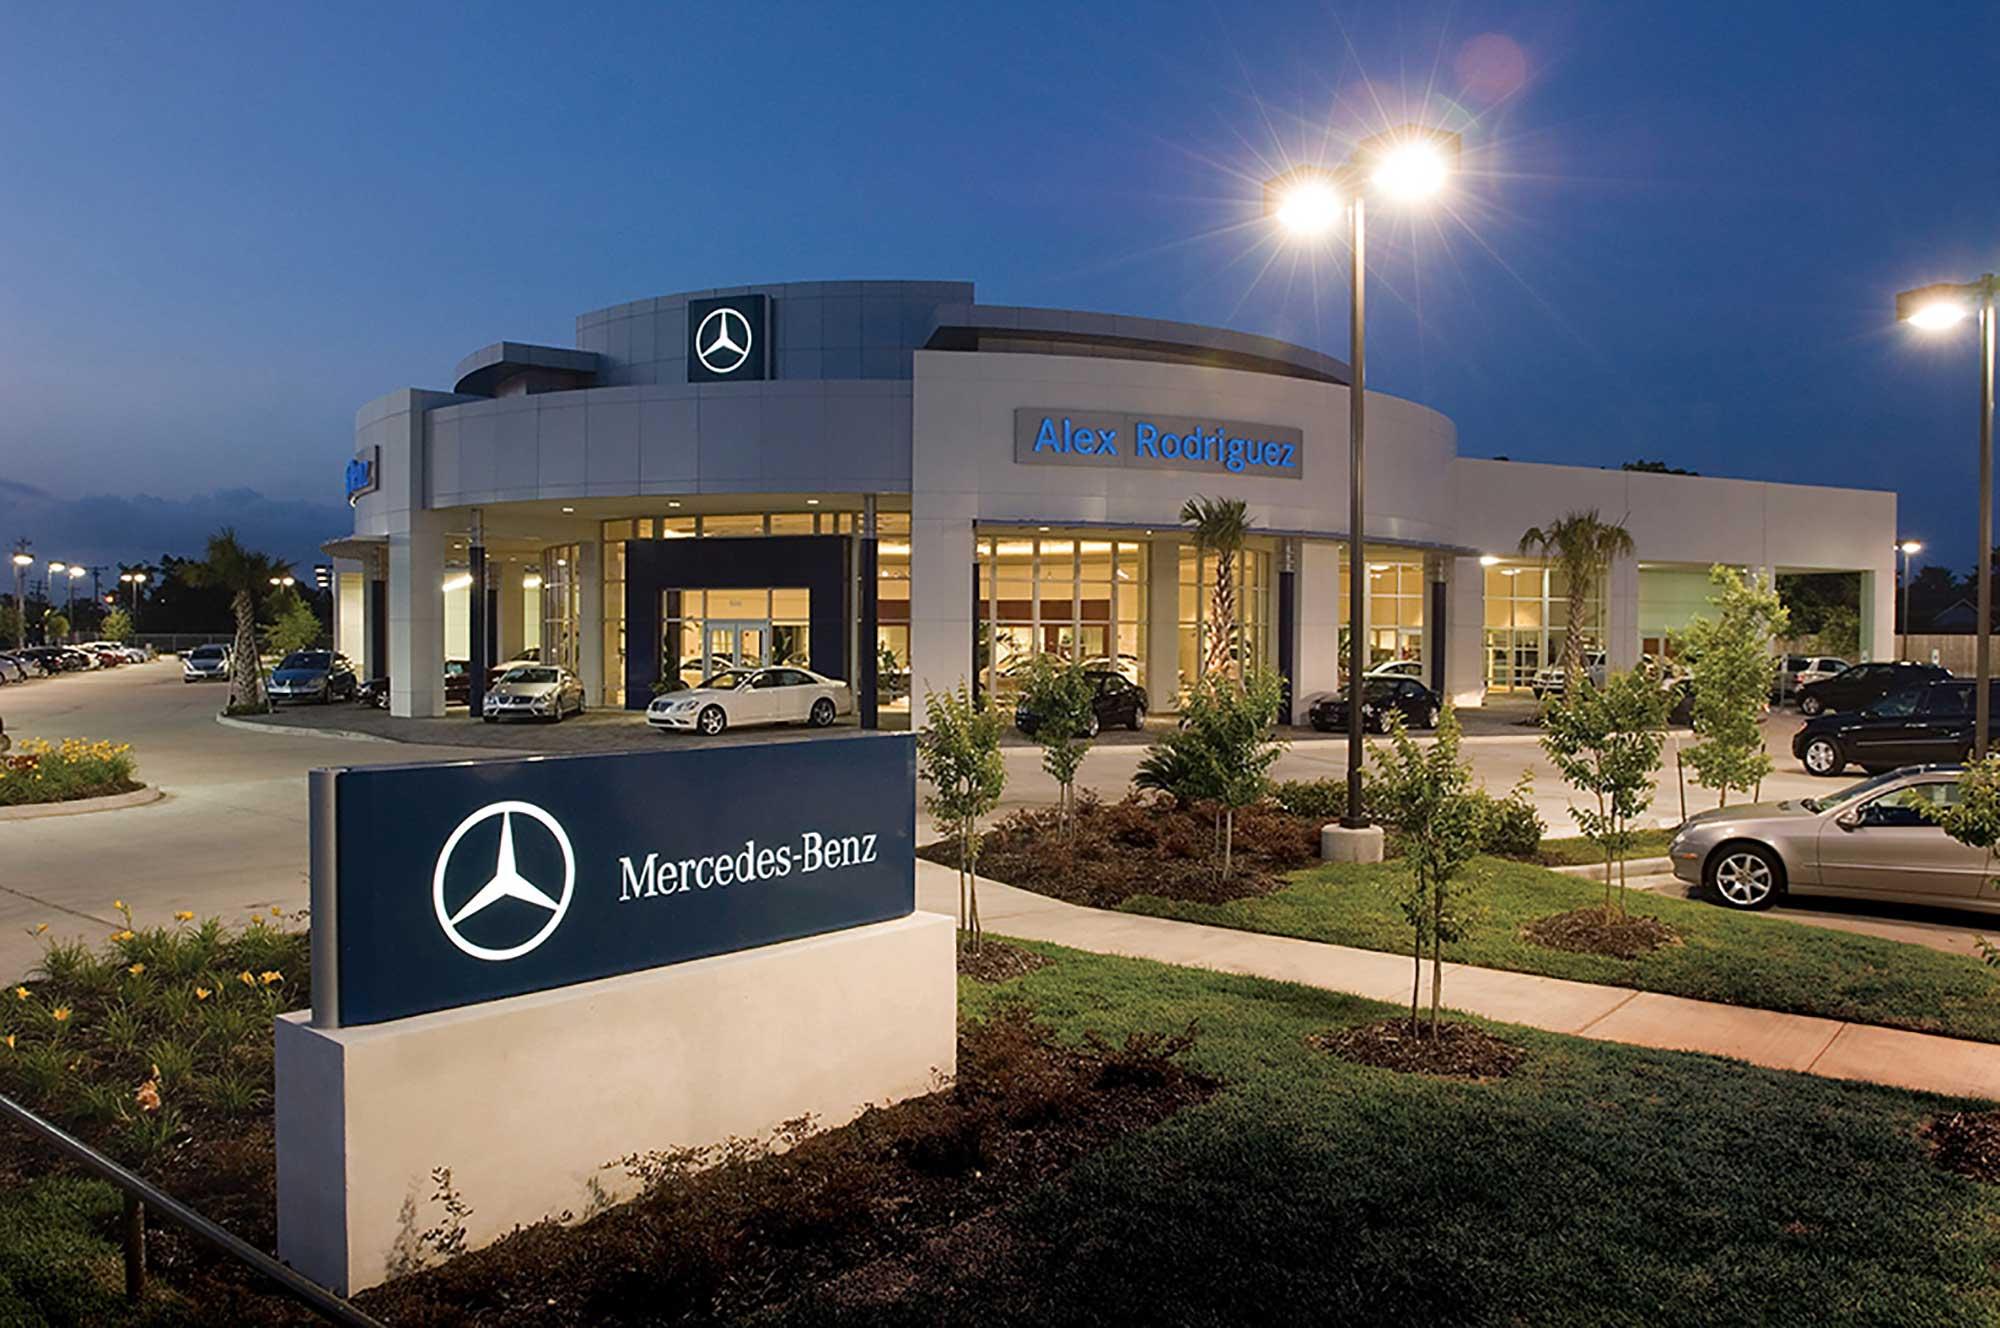 Gallery autobuildersautobuilders for Mercedes benz north orlando